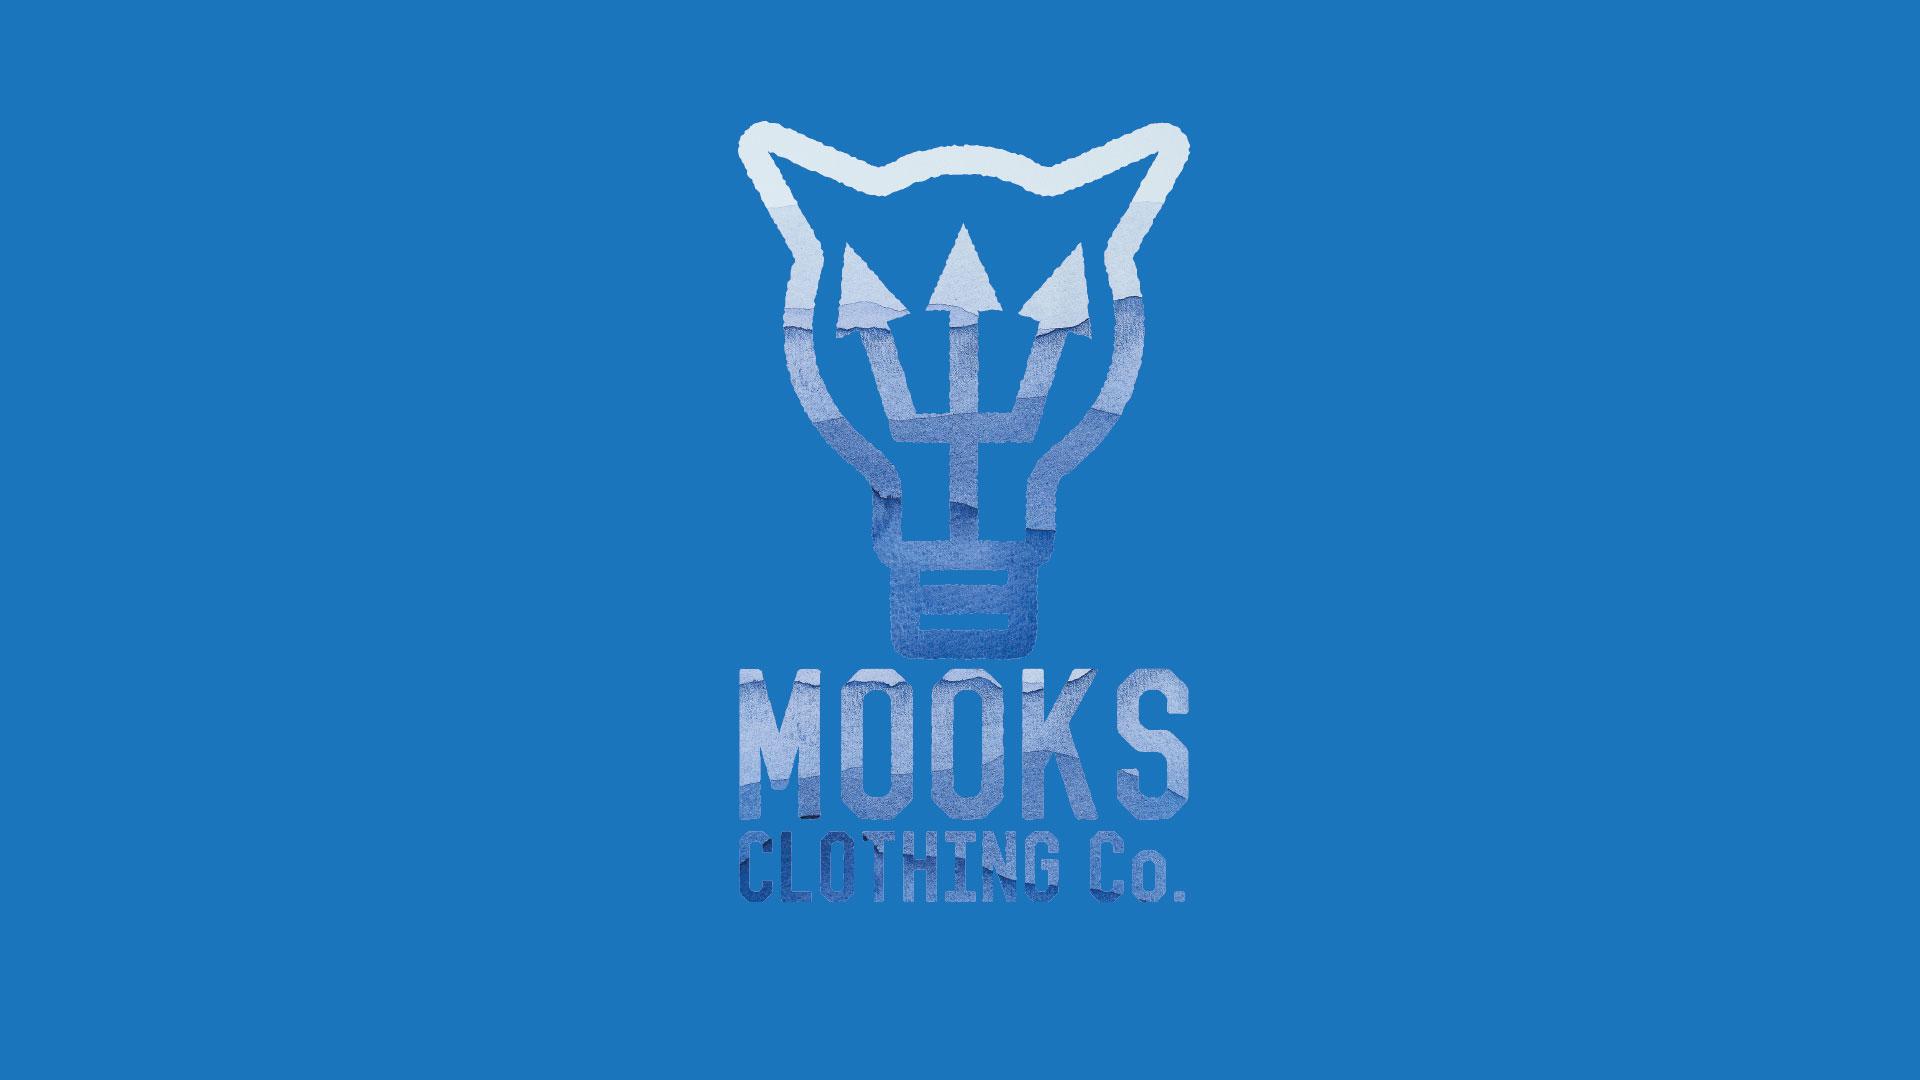 Mooks